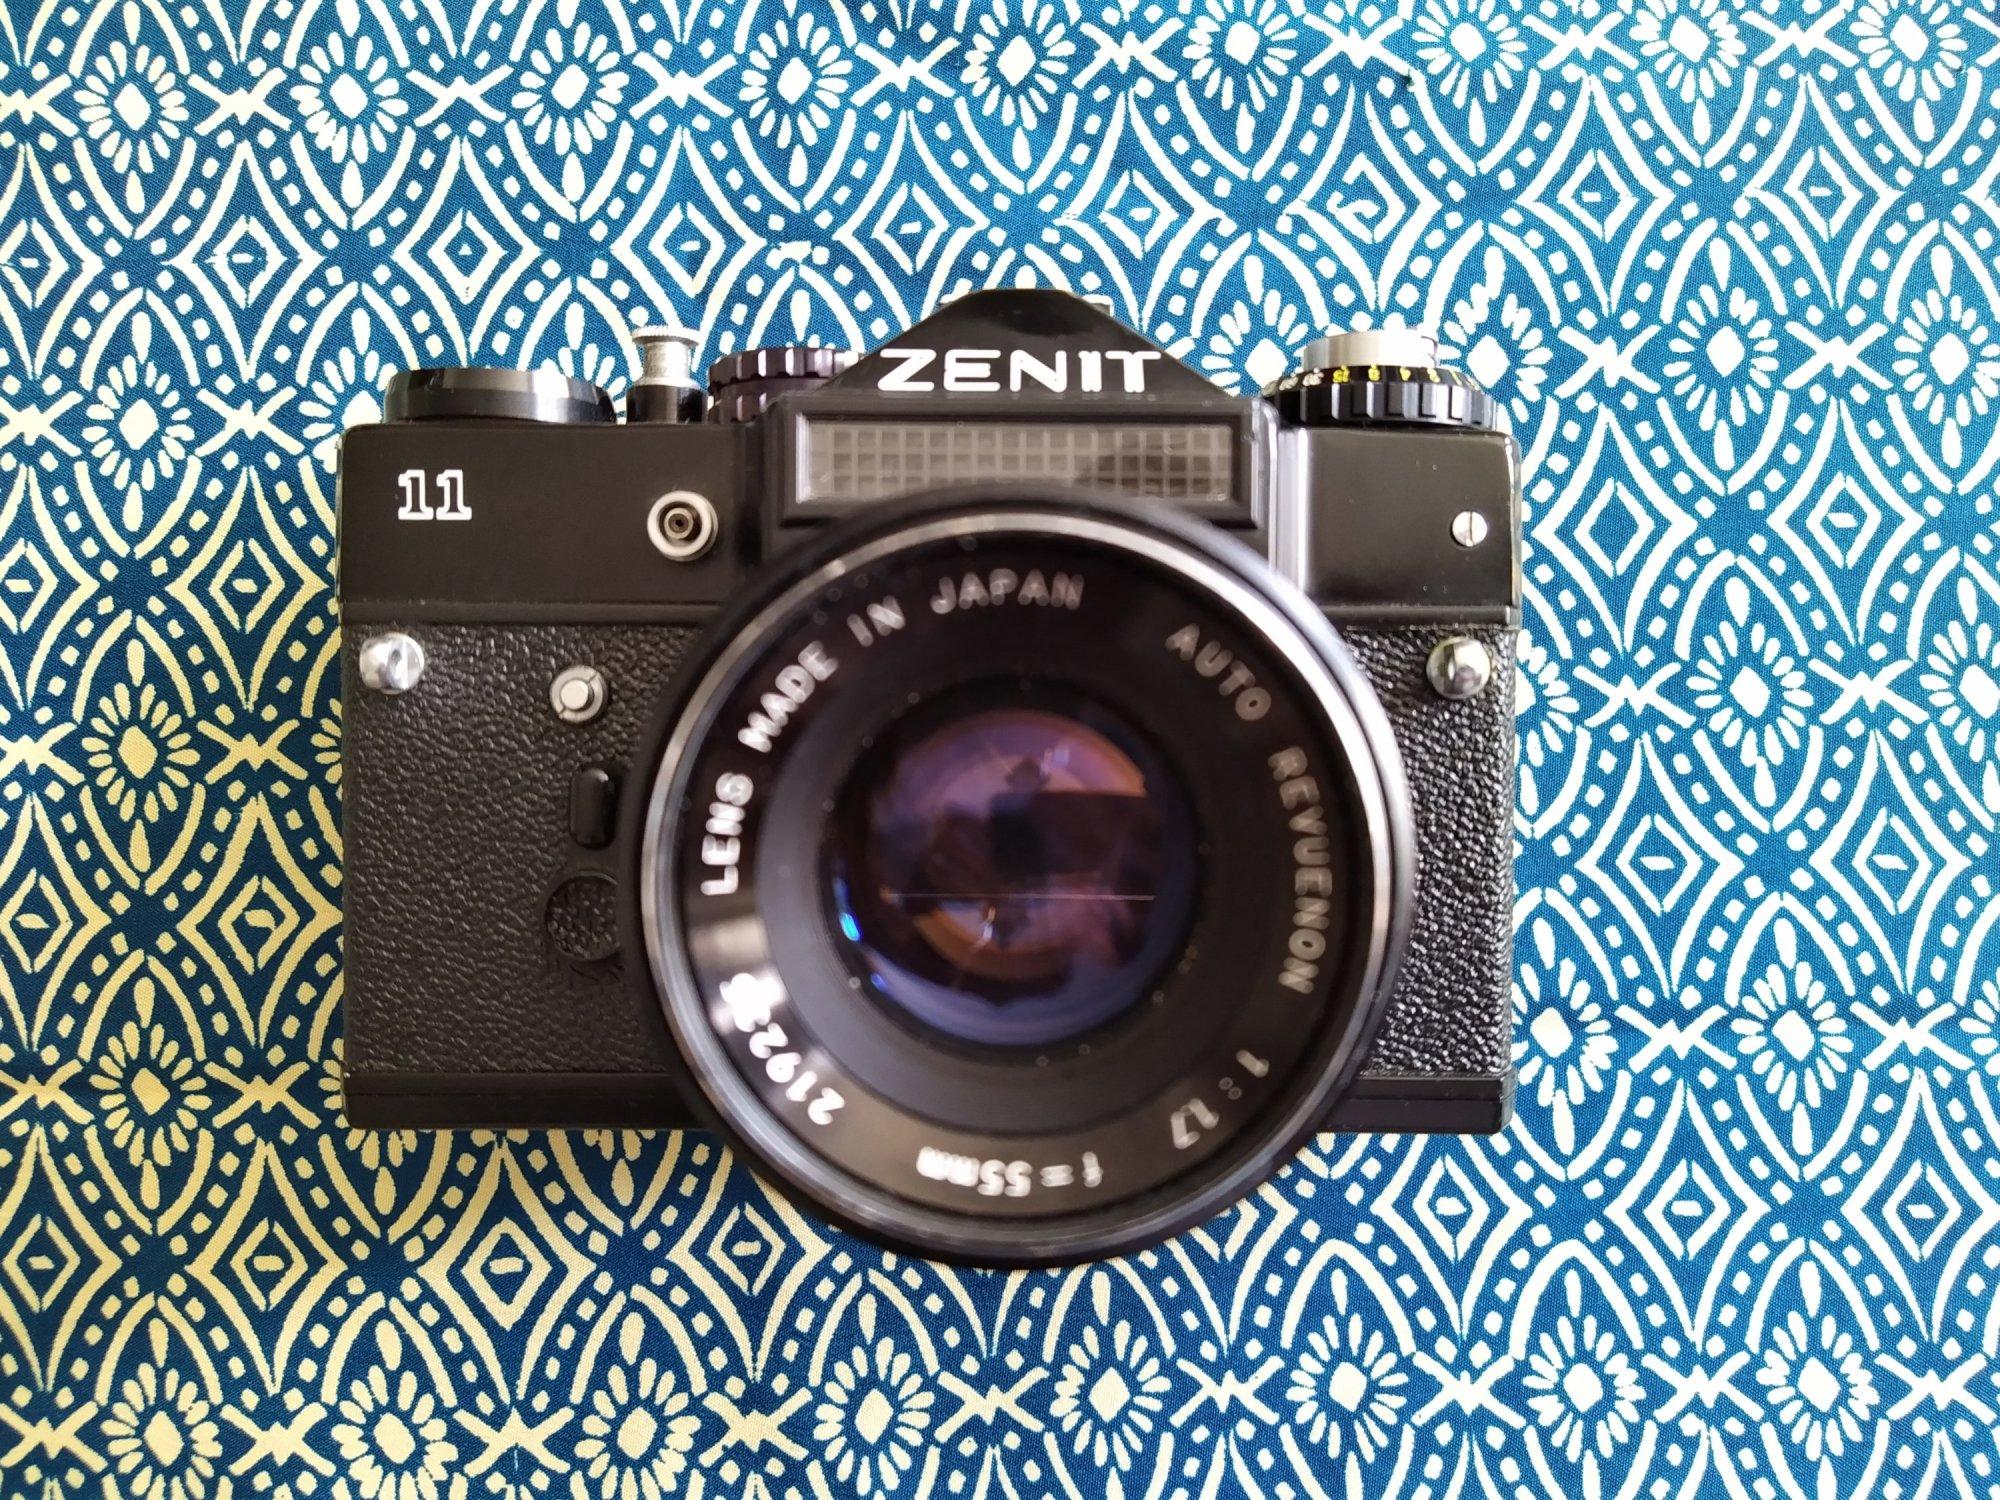 Zenit 11 front